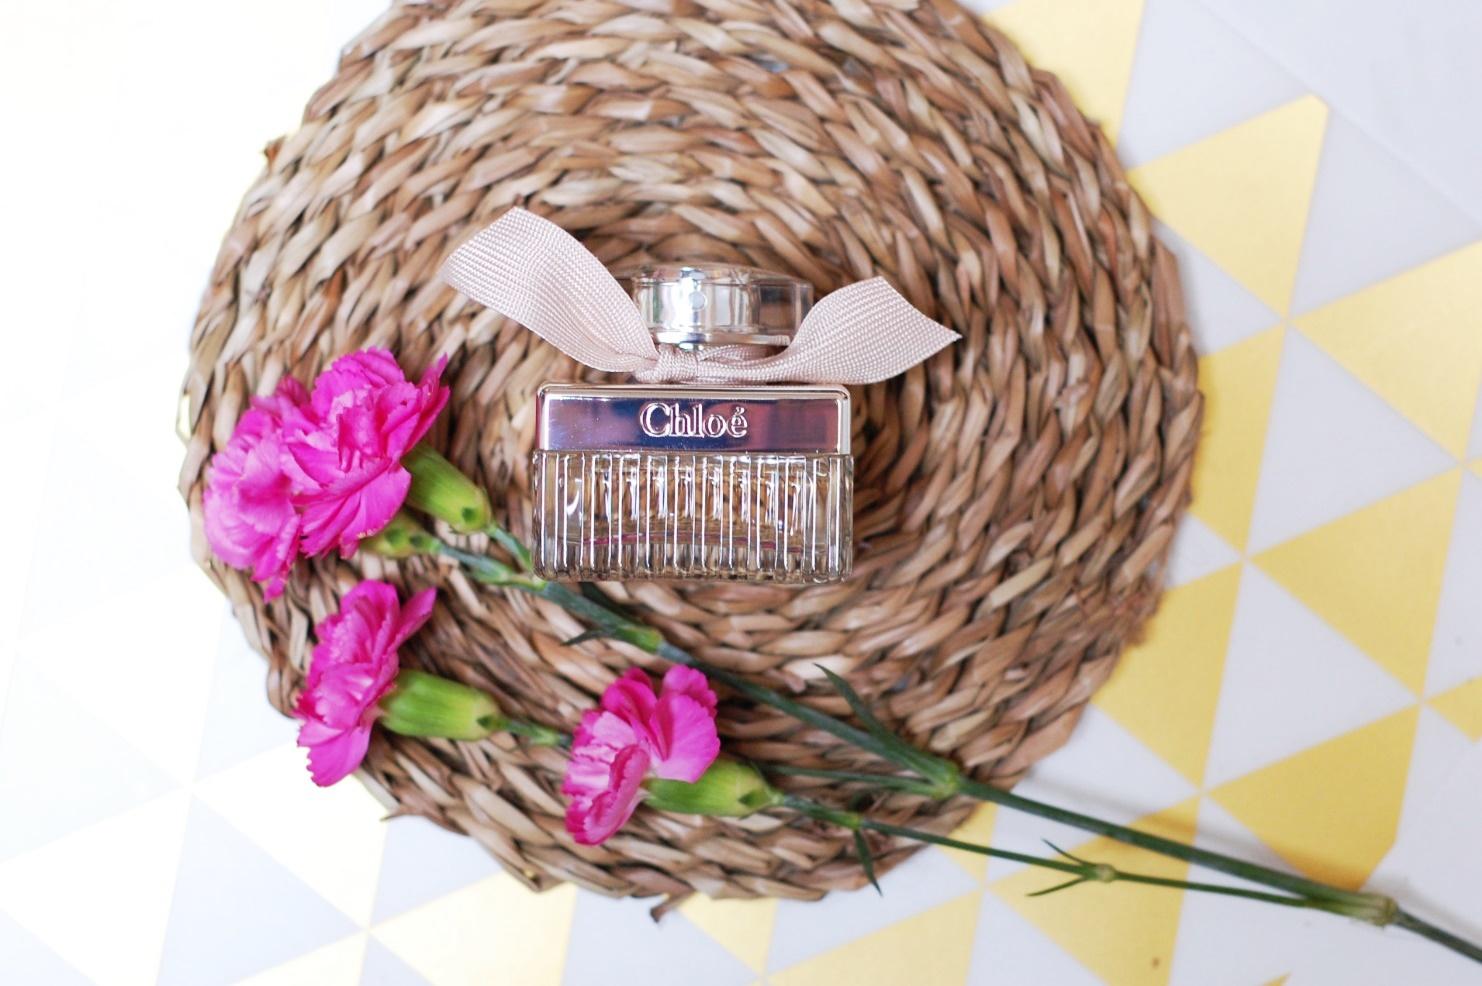 Chloé eau de parfum | iperfumy.pl